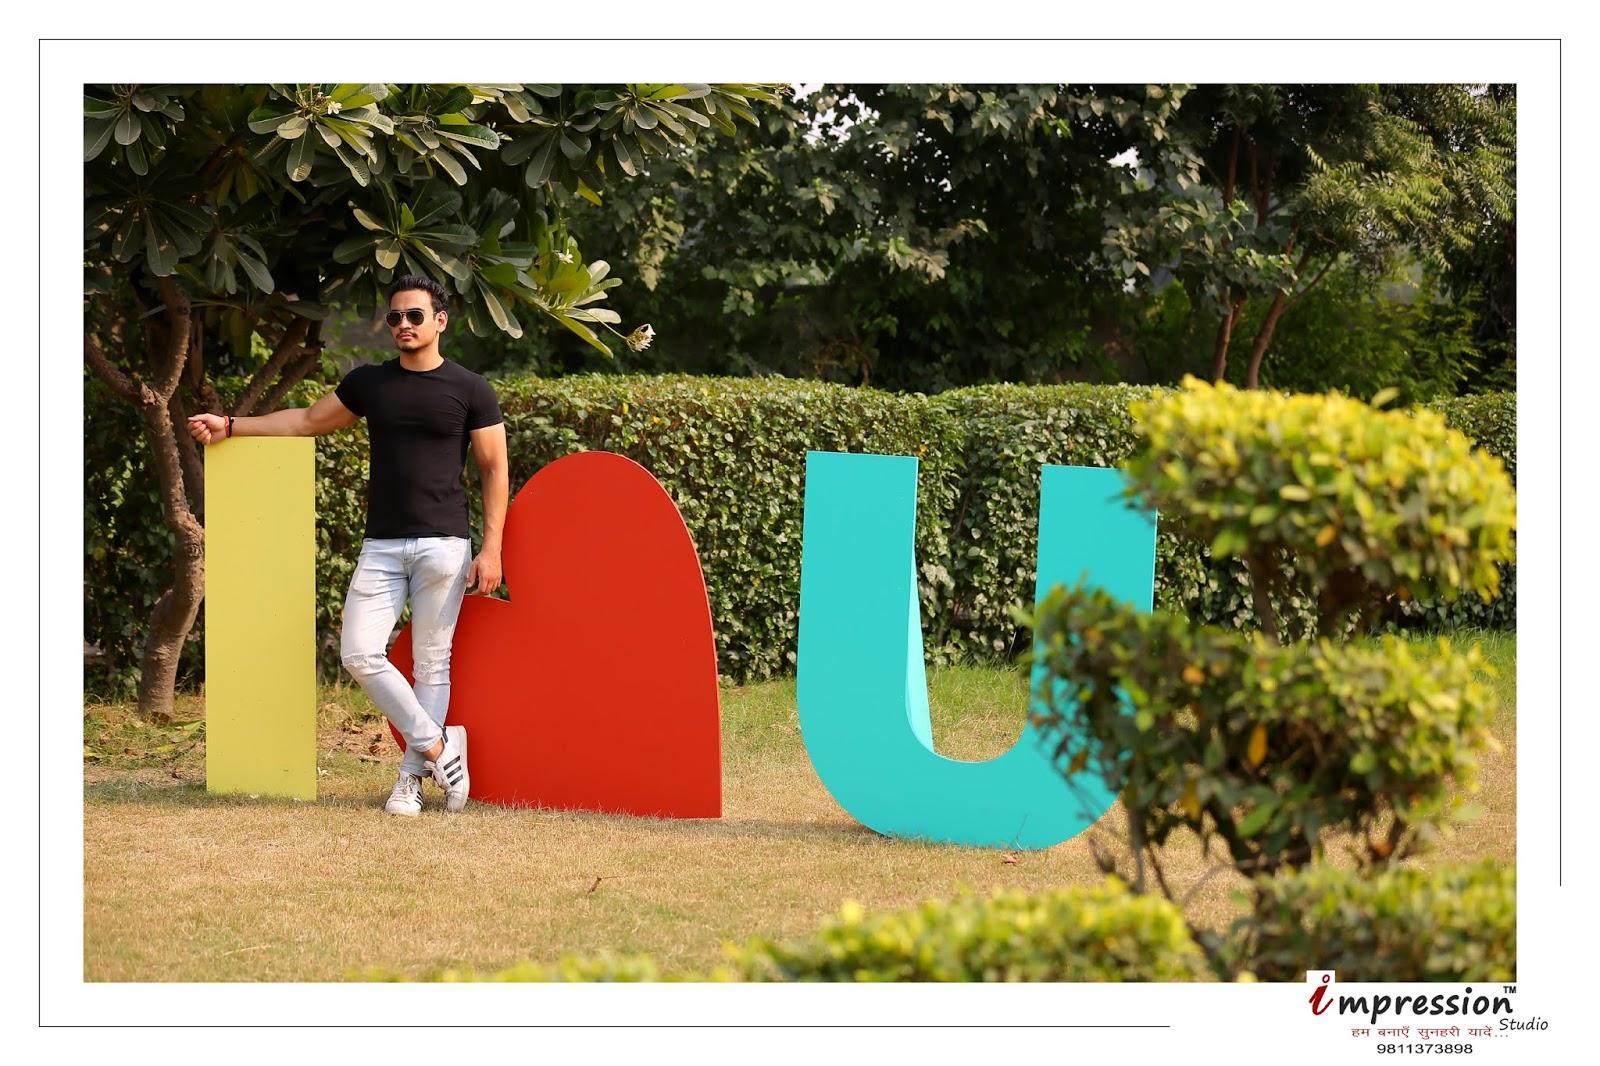 Photoshoot Shoot Locations In Delhi - Pre wedding | Shooting